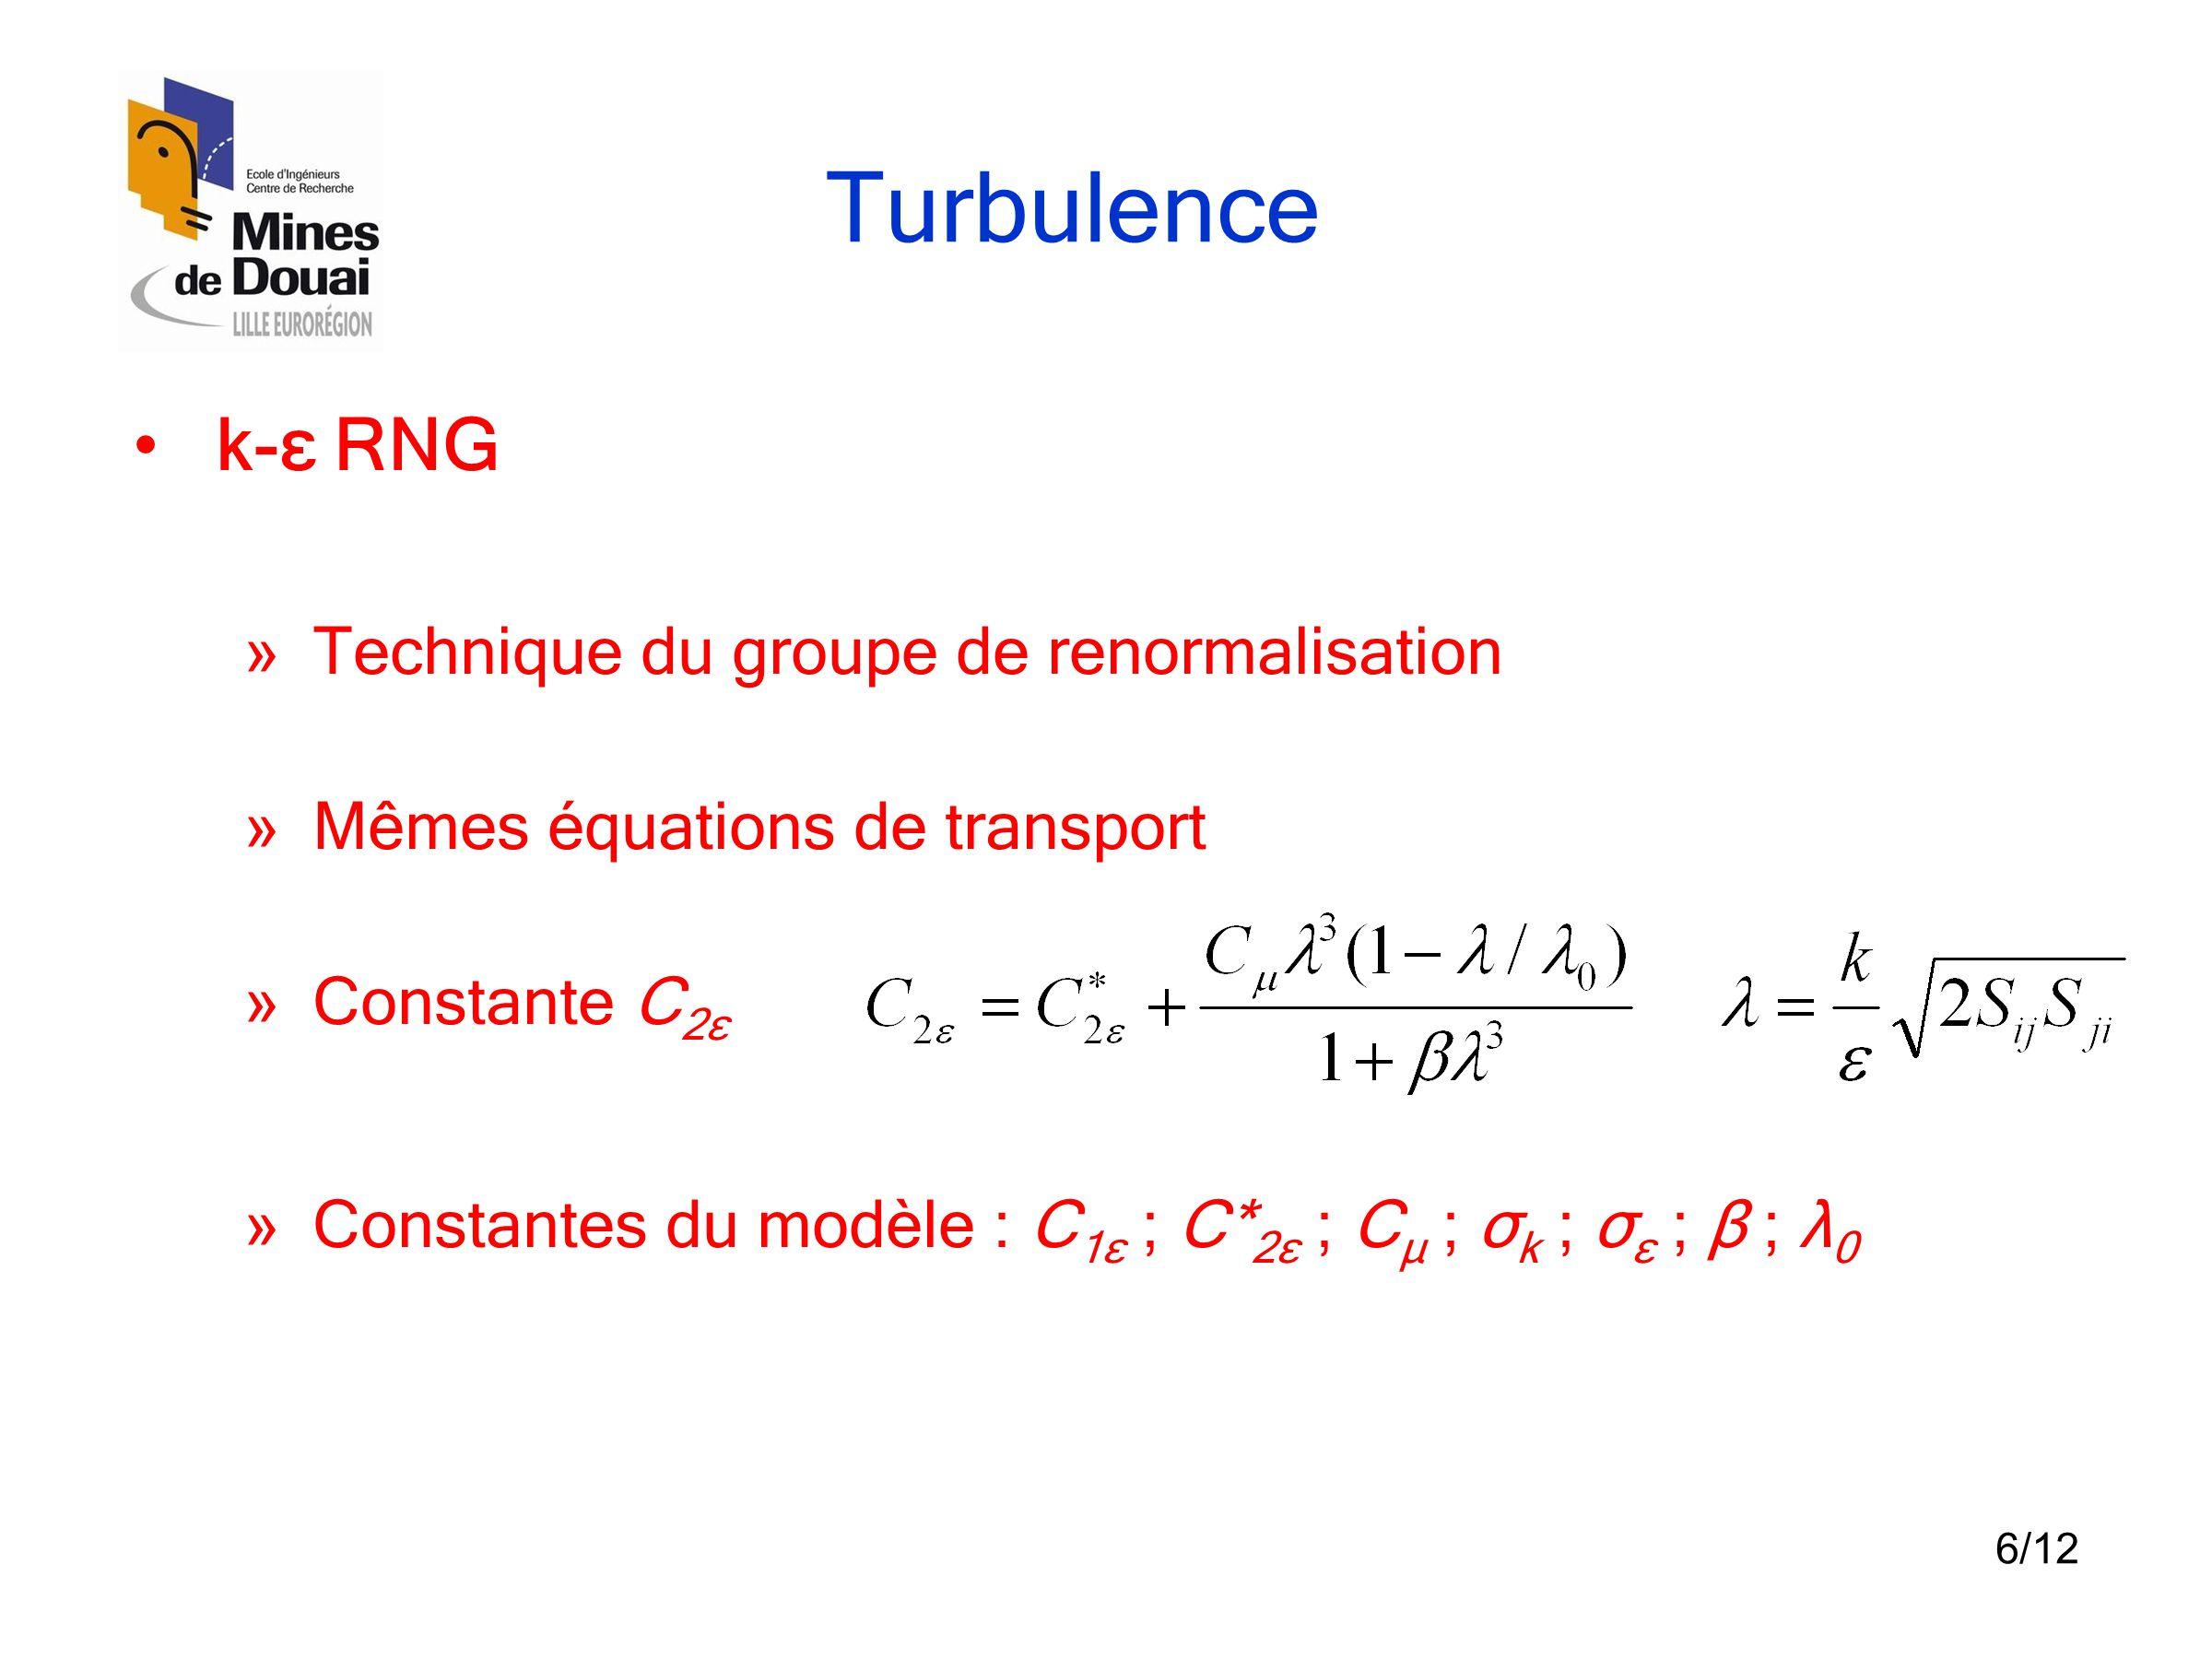 Turbulence k-ε bas-Reynolds Mêmes équations de transport